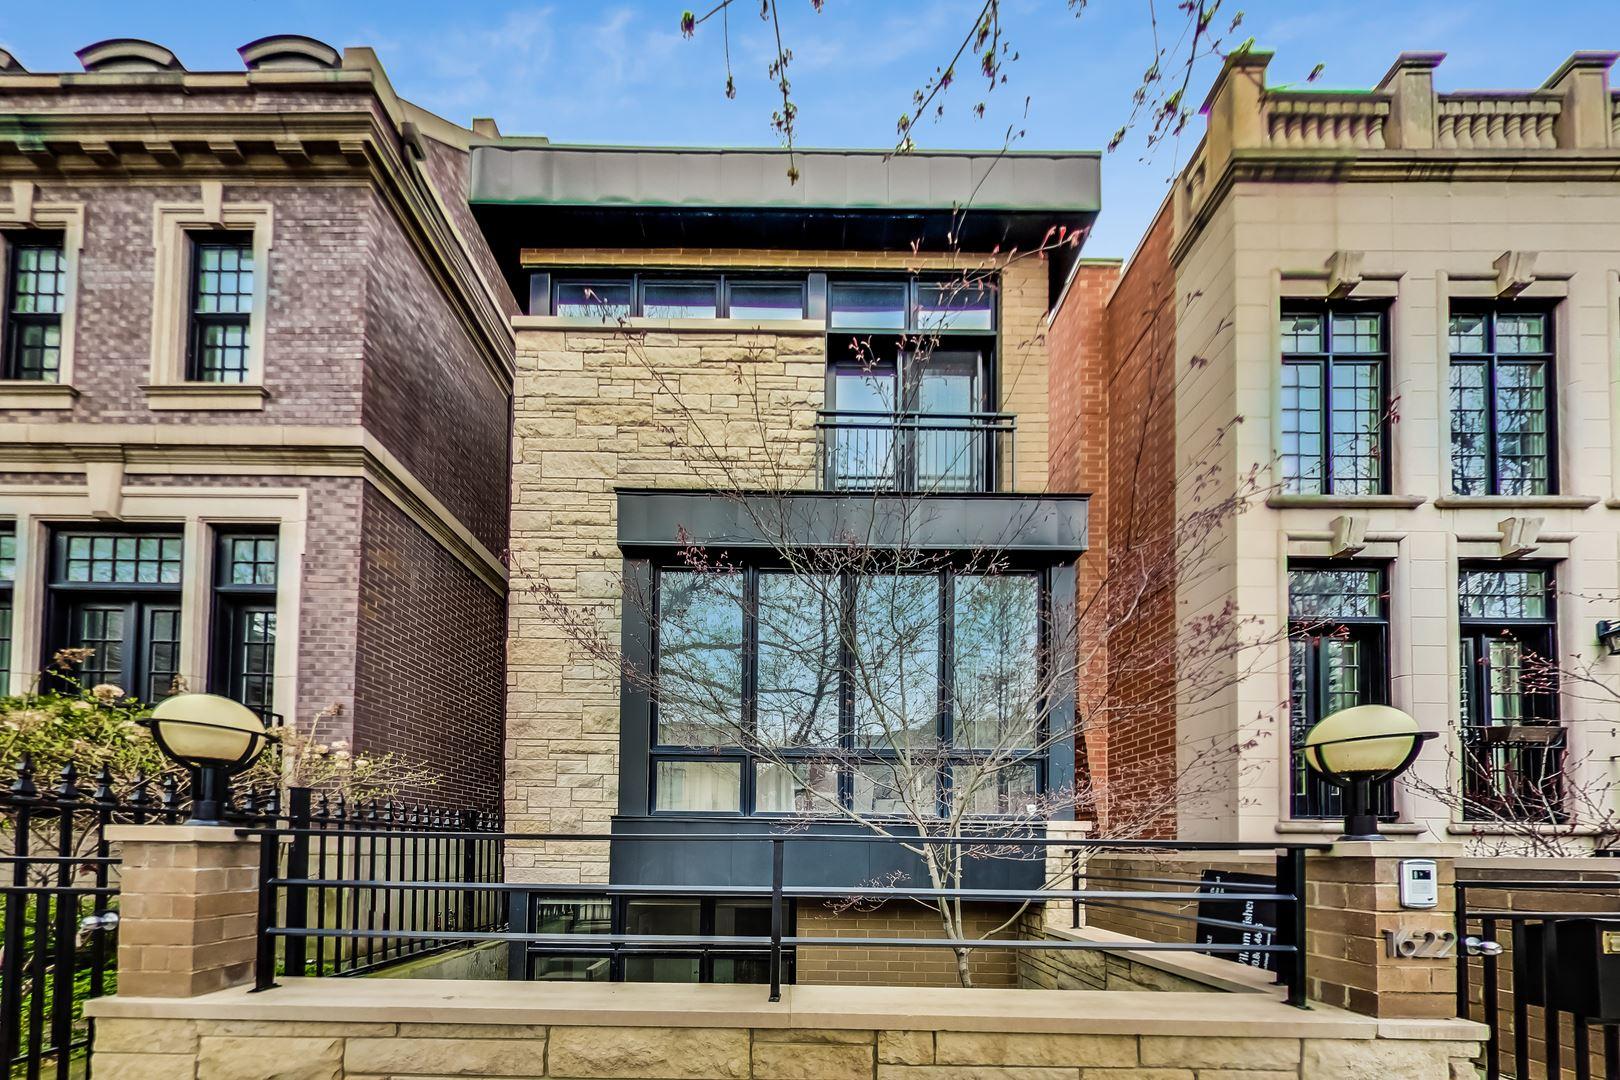 1622 N Hermitage Avenue, Chicago, IL 60622 - #: 10650261